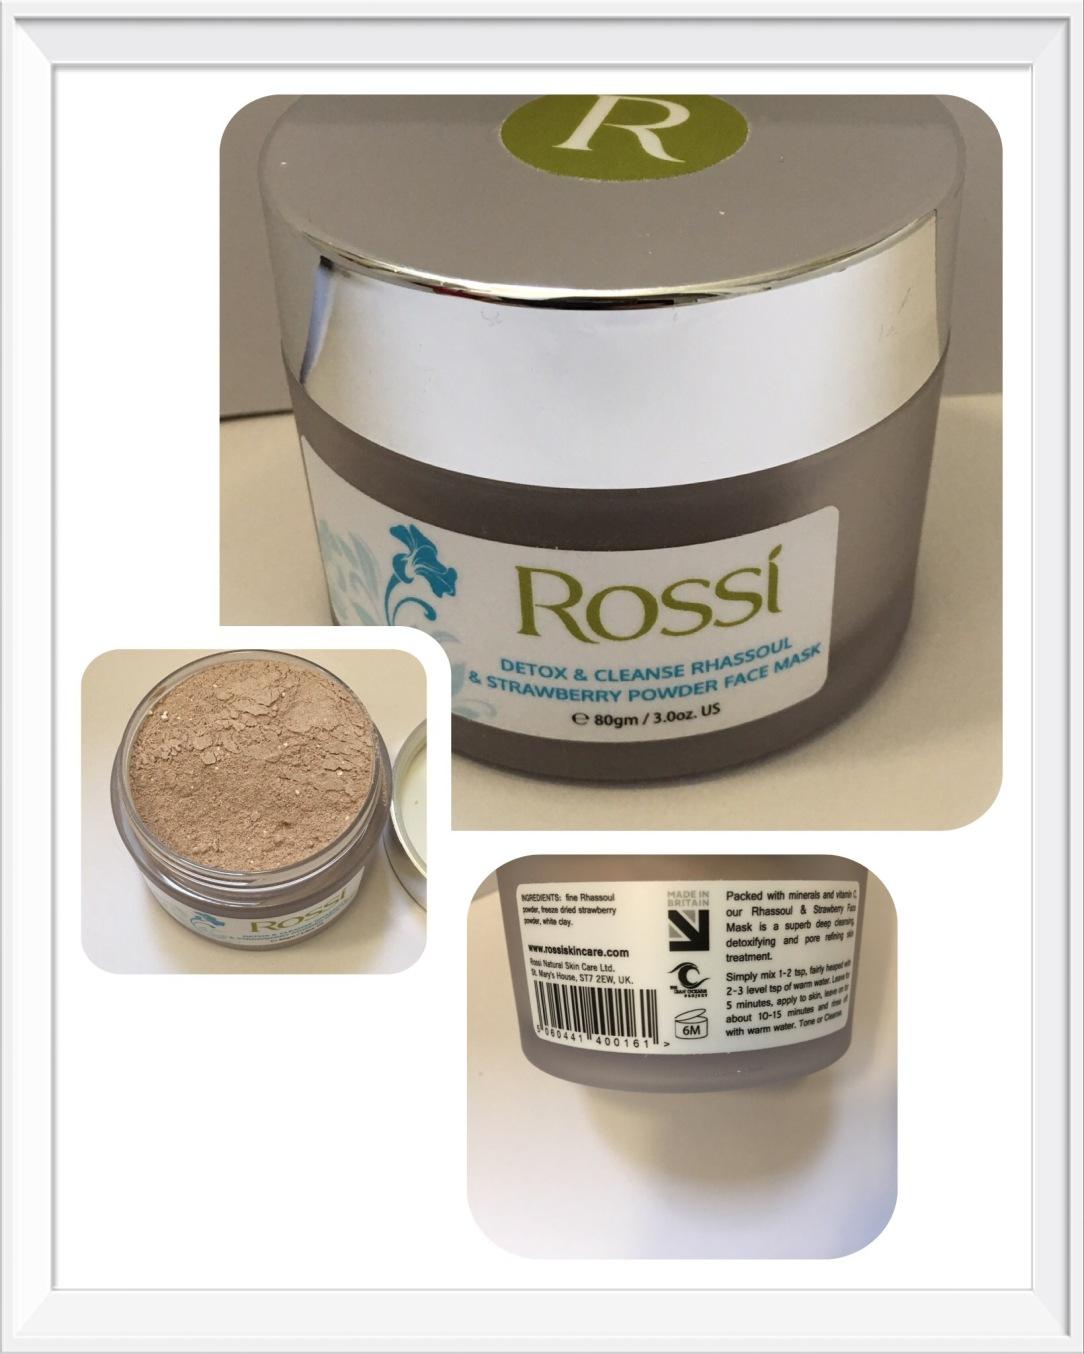 Rossi Uvema Rhassoul & Strawberry Powder Face Mask